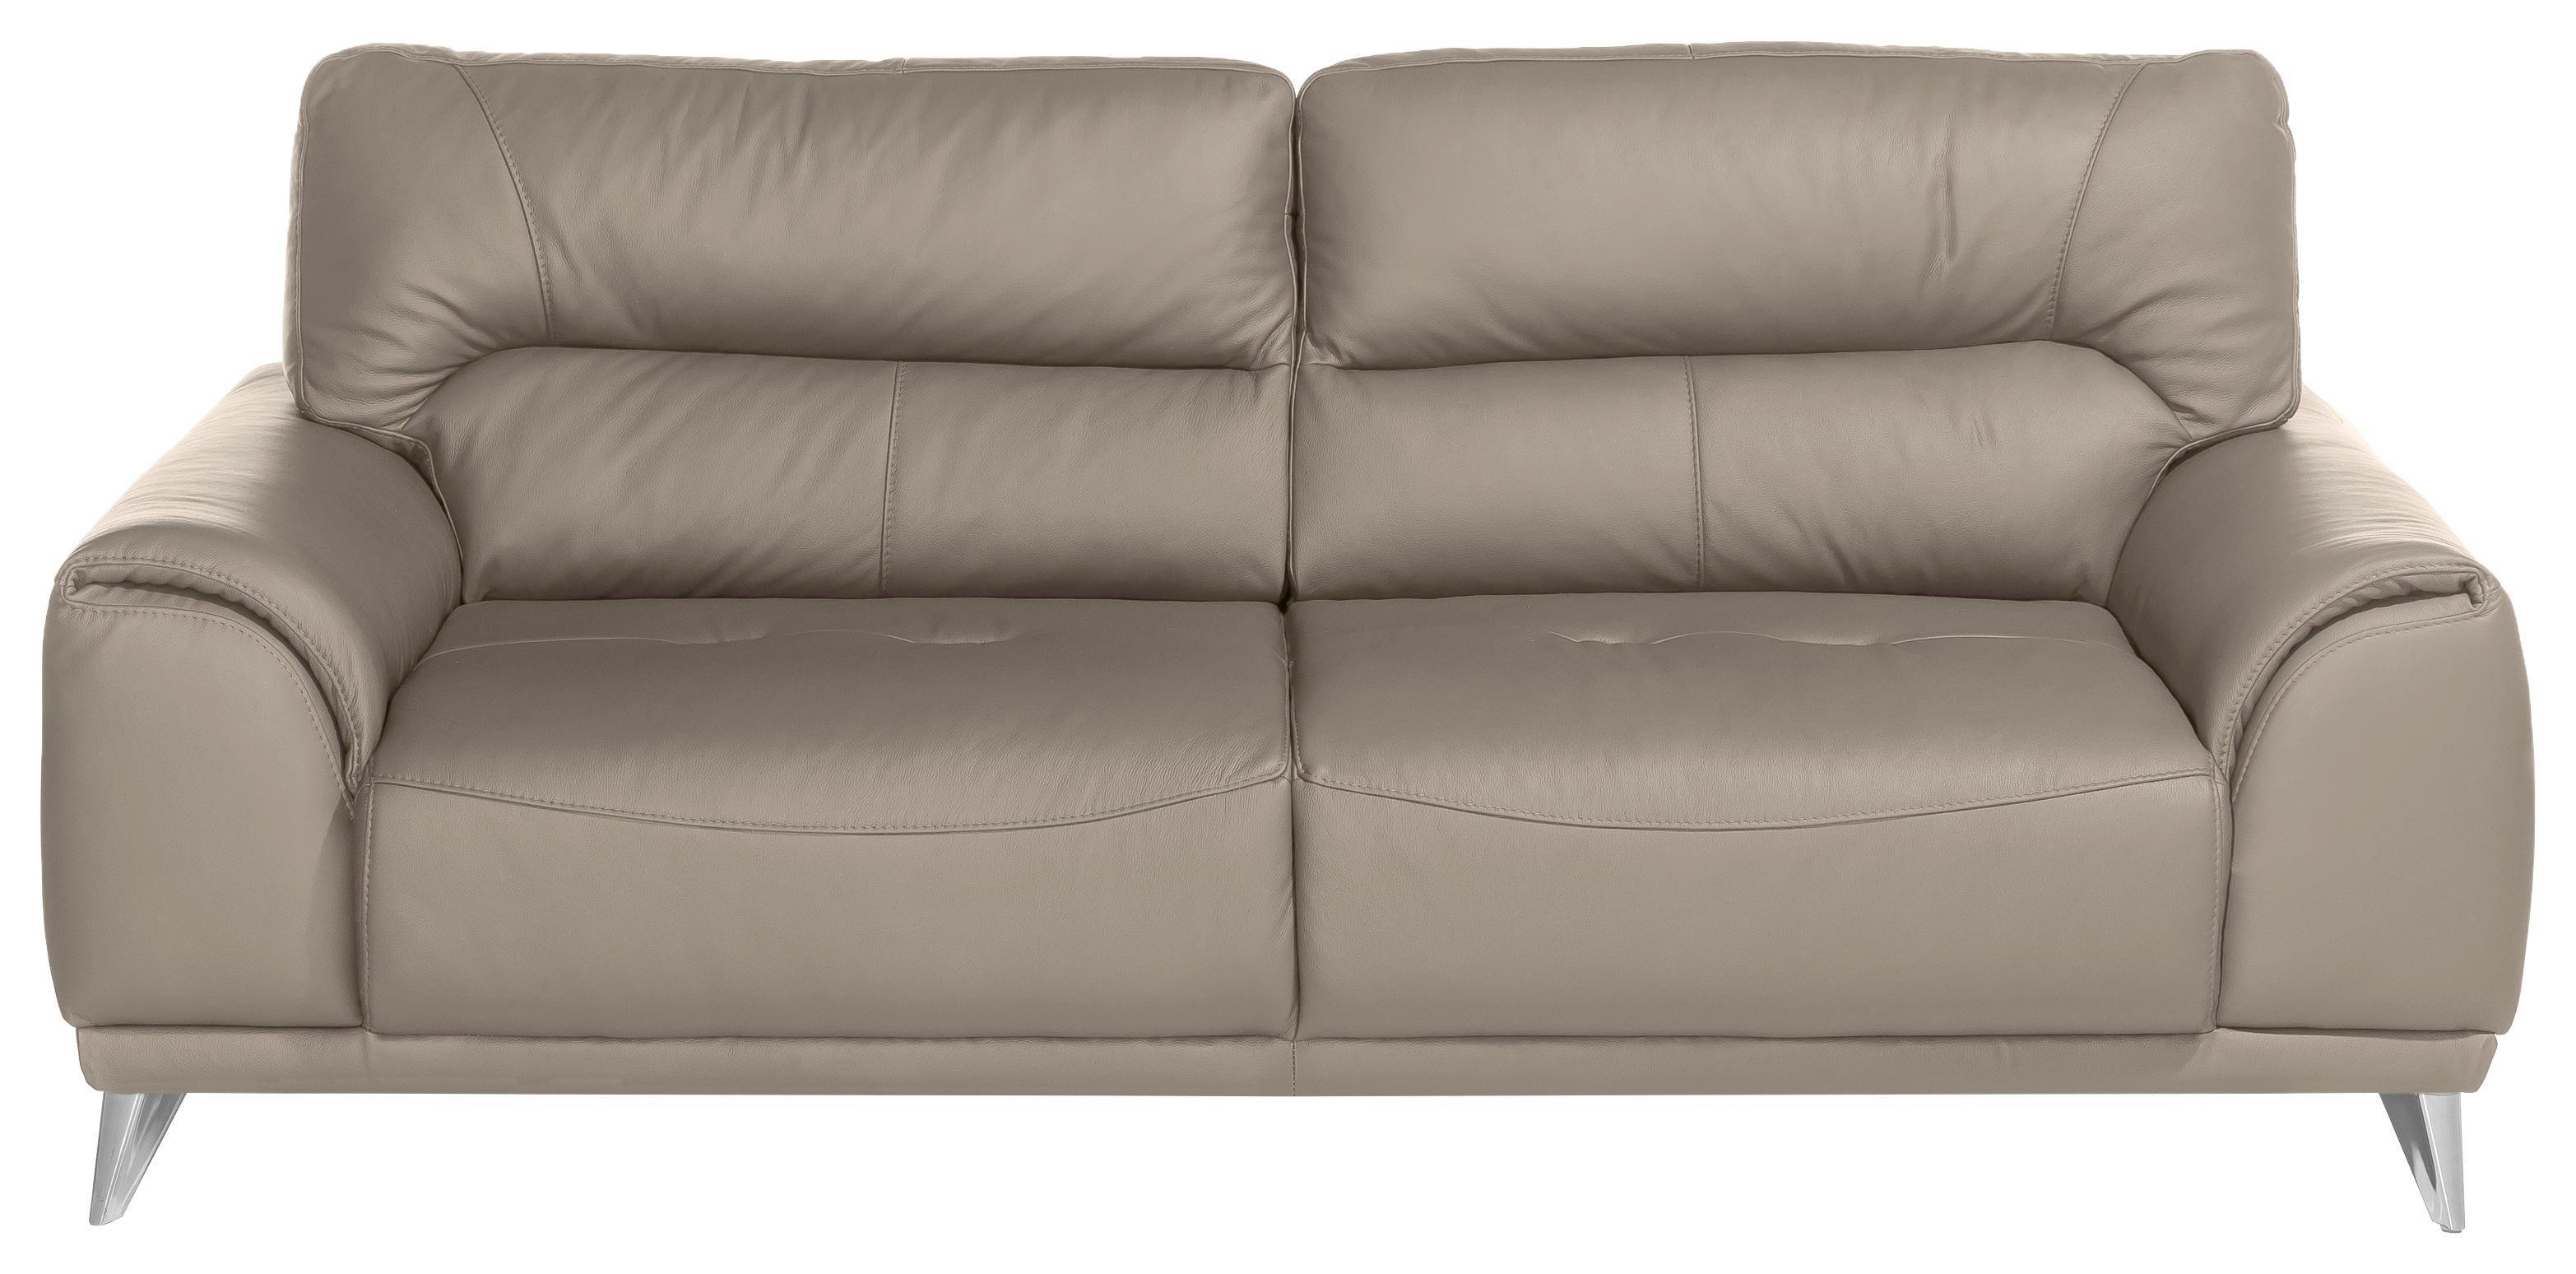 Dreisitzer Sofa Frisco   Sandfarben/Chromfarben, MODERN, Textil (210/92